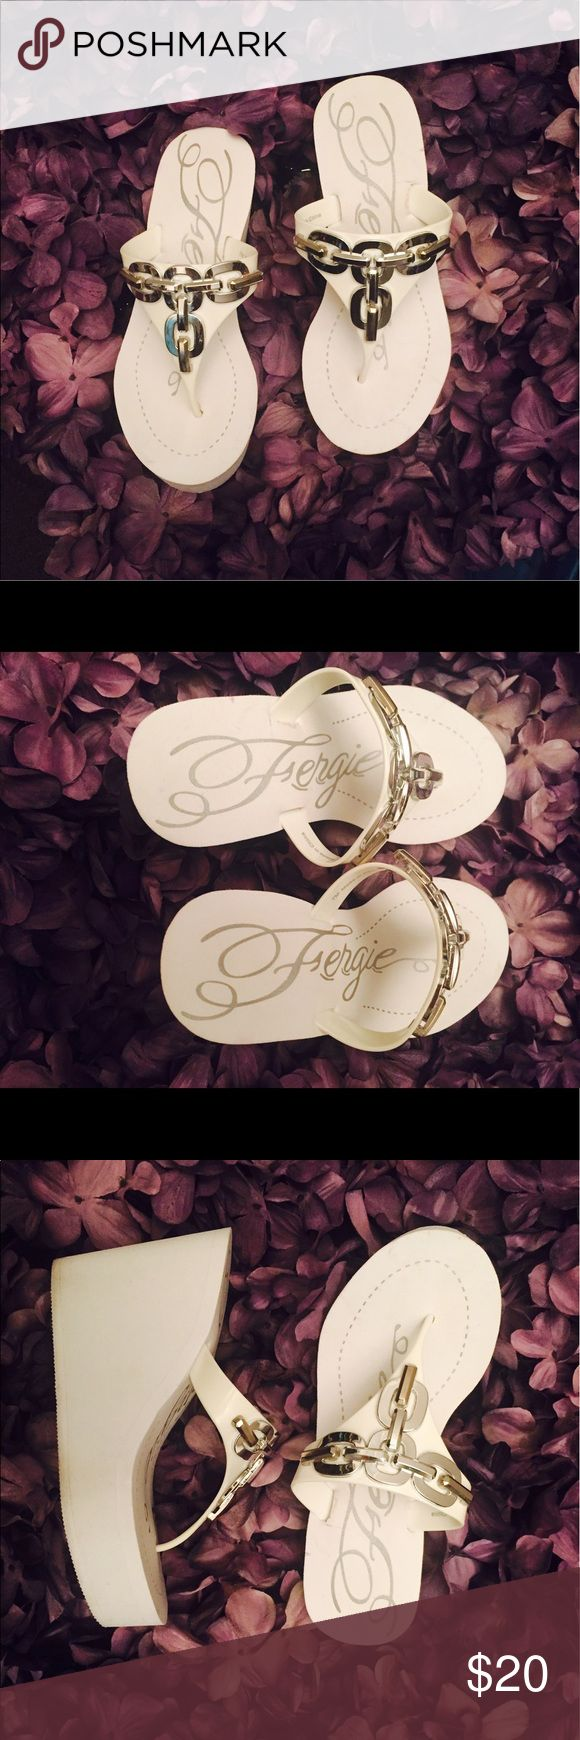 Fergies Platform Wedge Sandals Worn Once Fergie Shoes Sandals